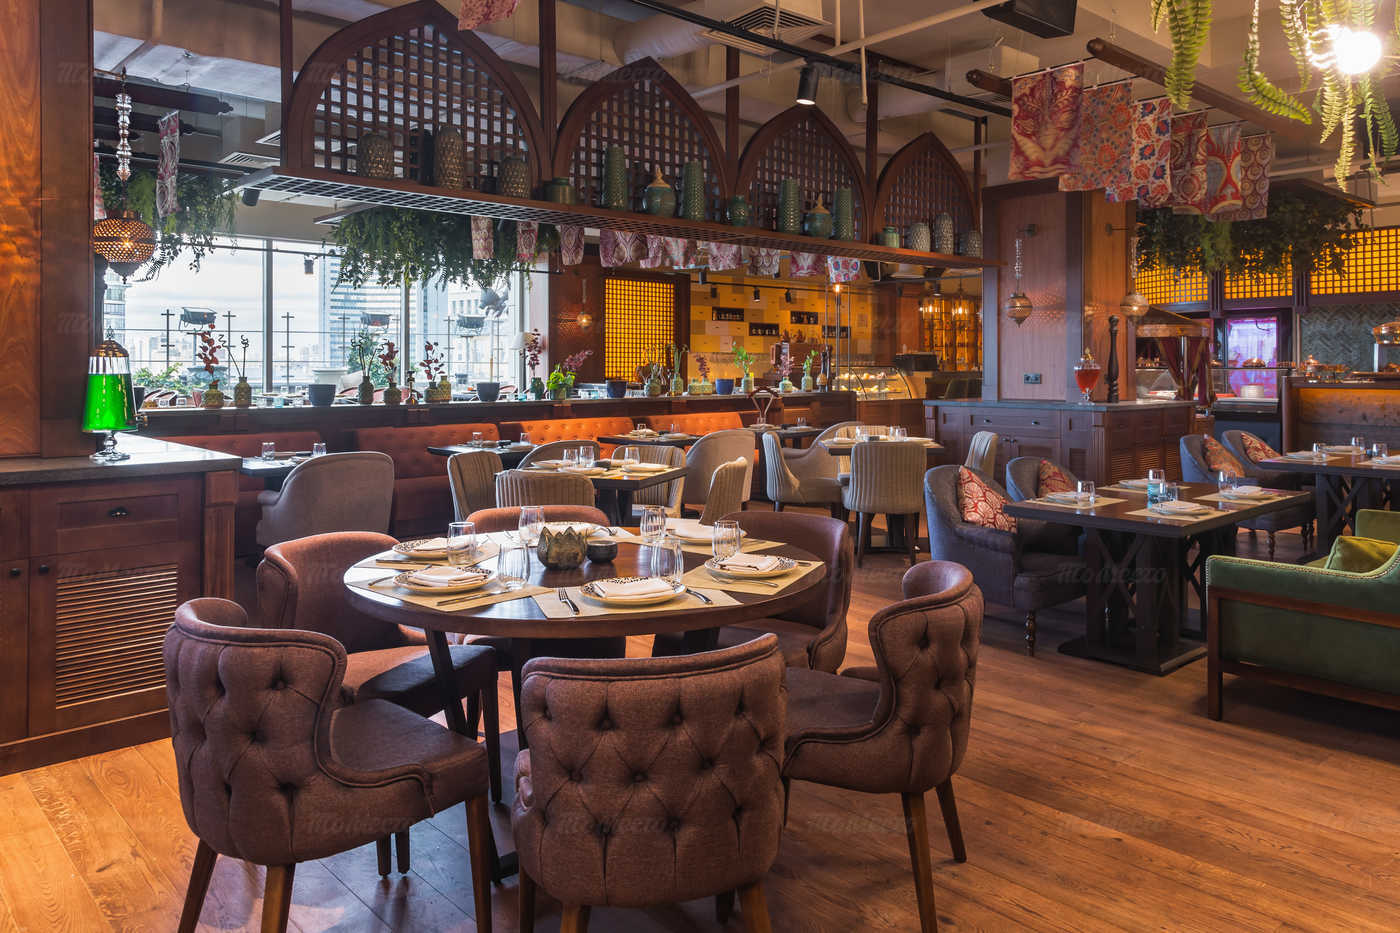 Ресторан Левантин (Levantine) на Новинском бульваре фото 10